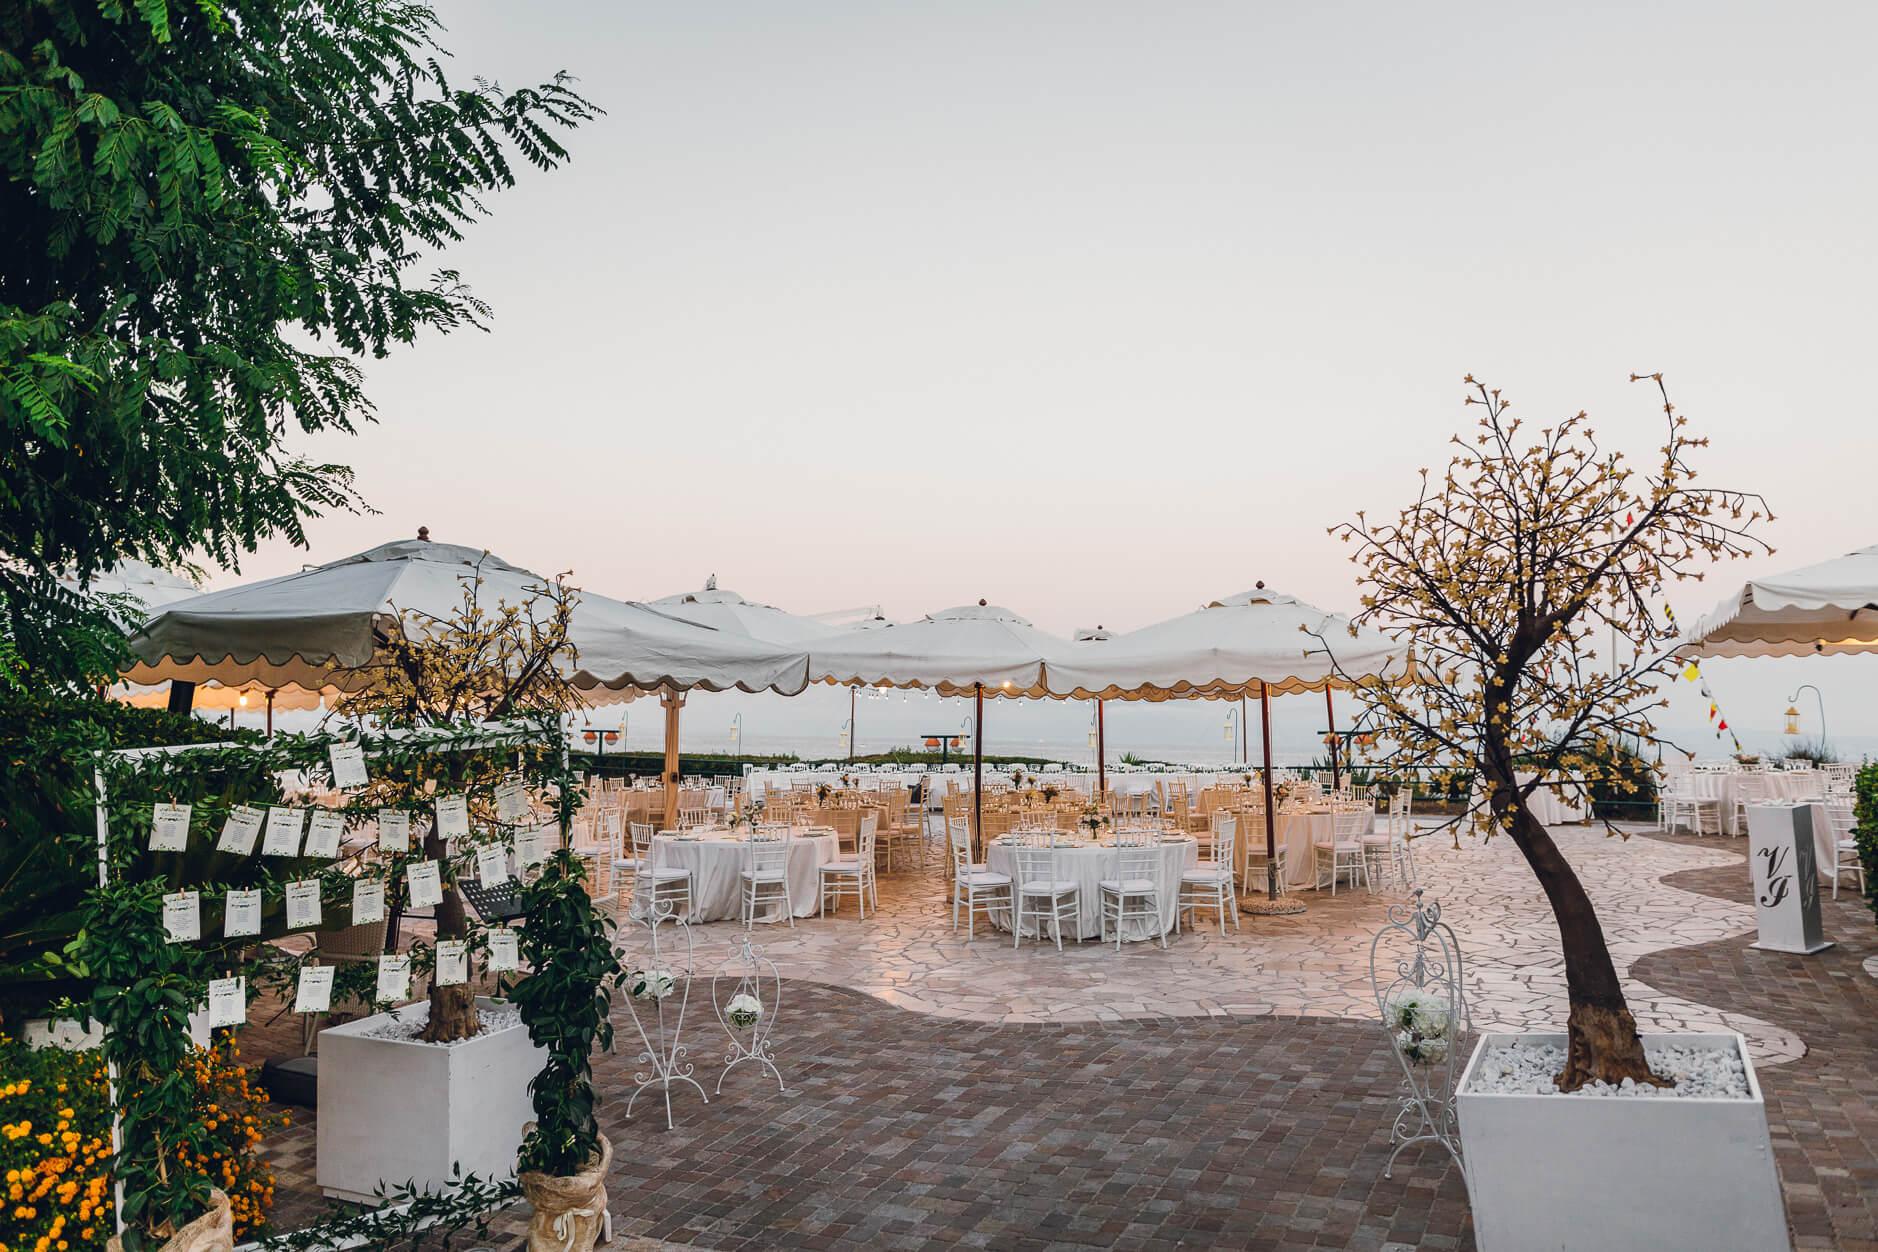 Matrimoni Spiaggia Napoli : Villa imperiale posillipo napoli joyphotographers